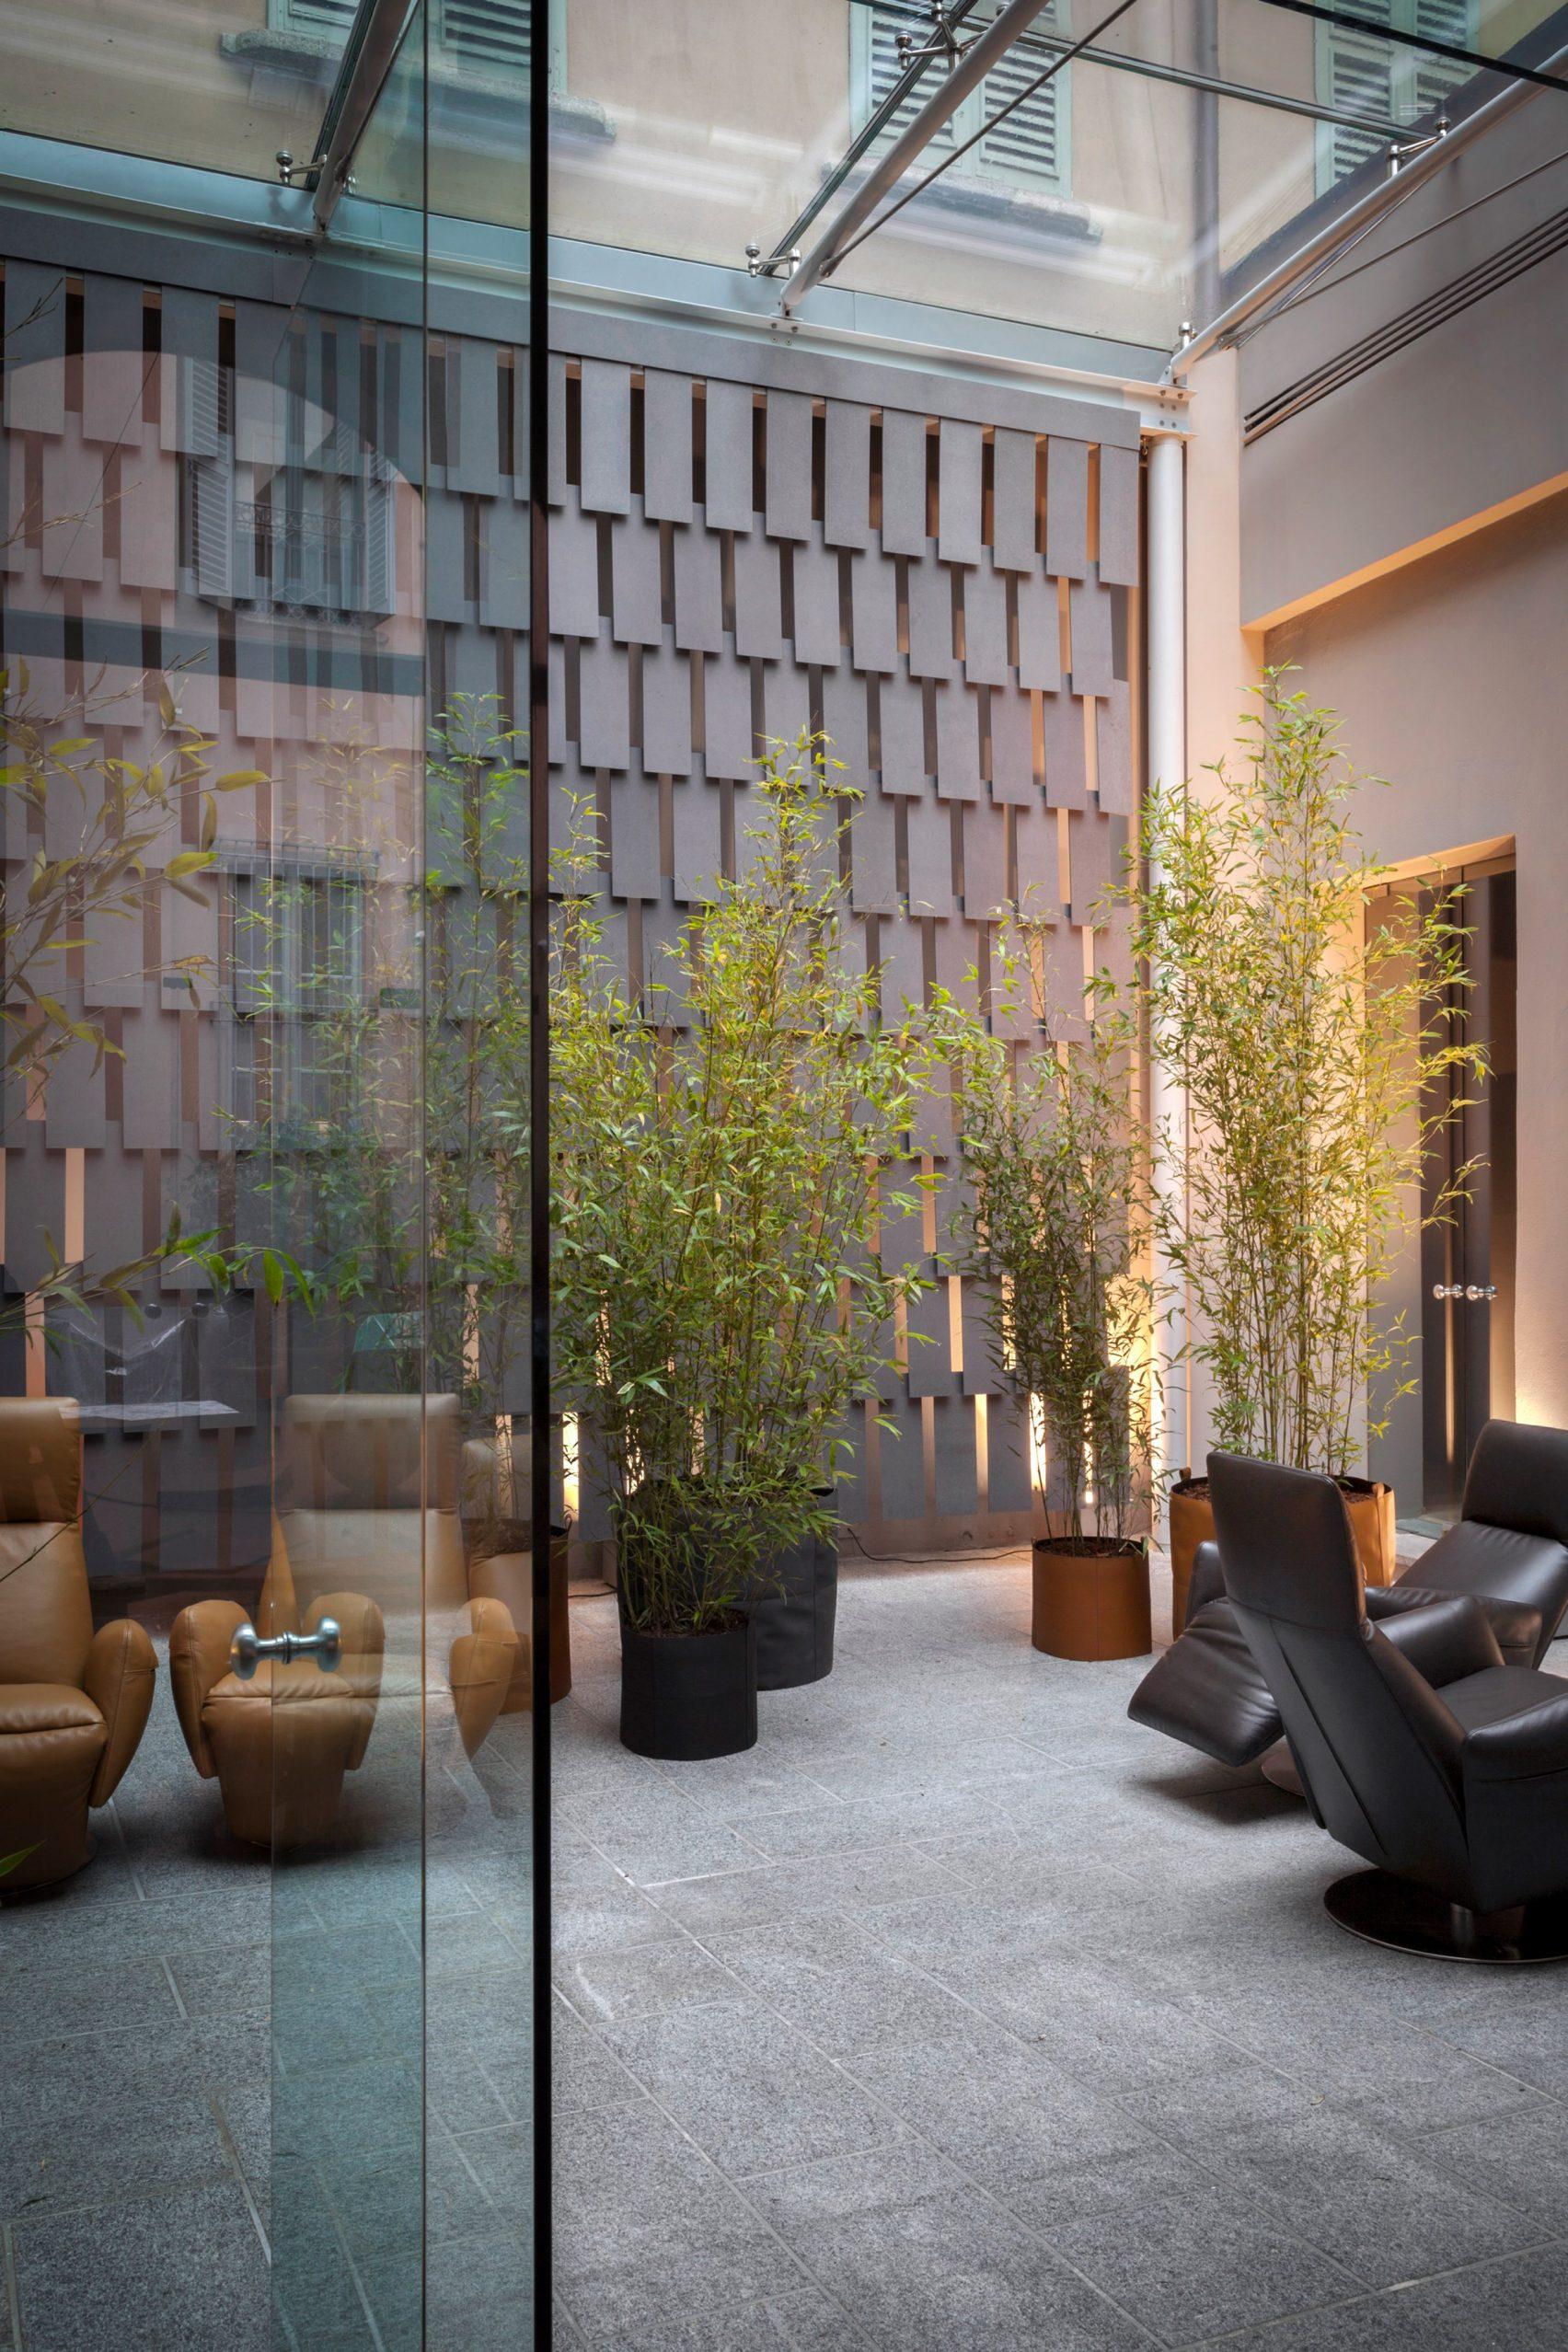 Michele De Lucchi designed the showroom of Italian furniture brand Poltrona Frau for Milan design week